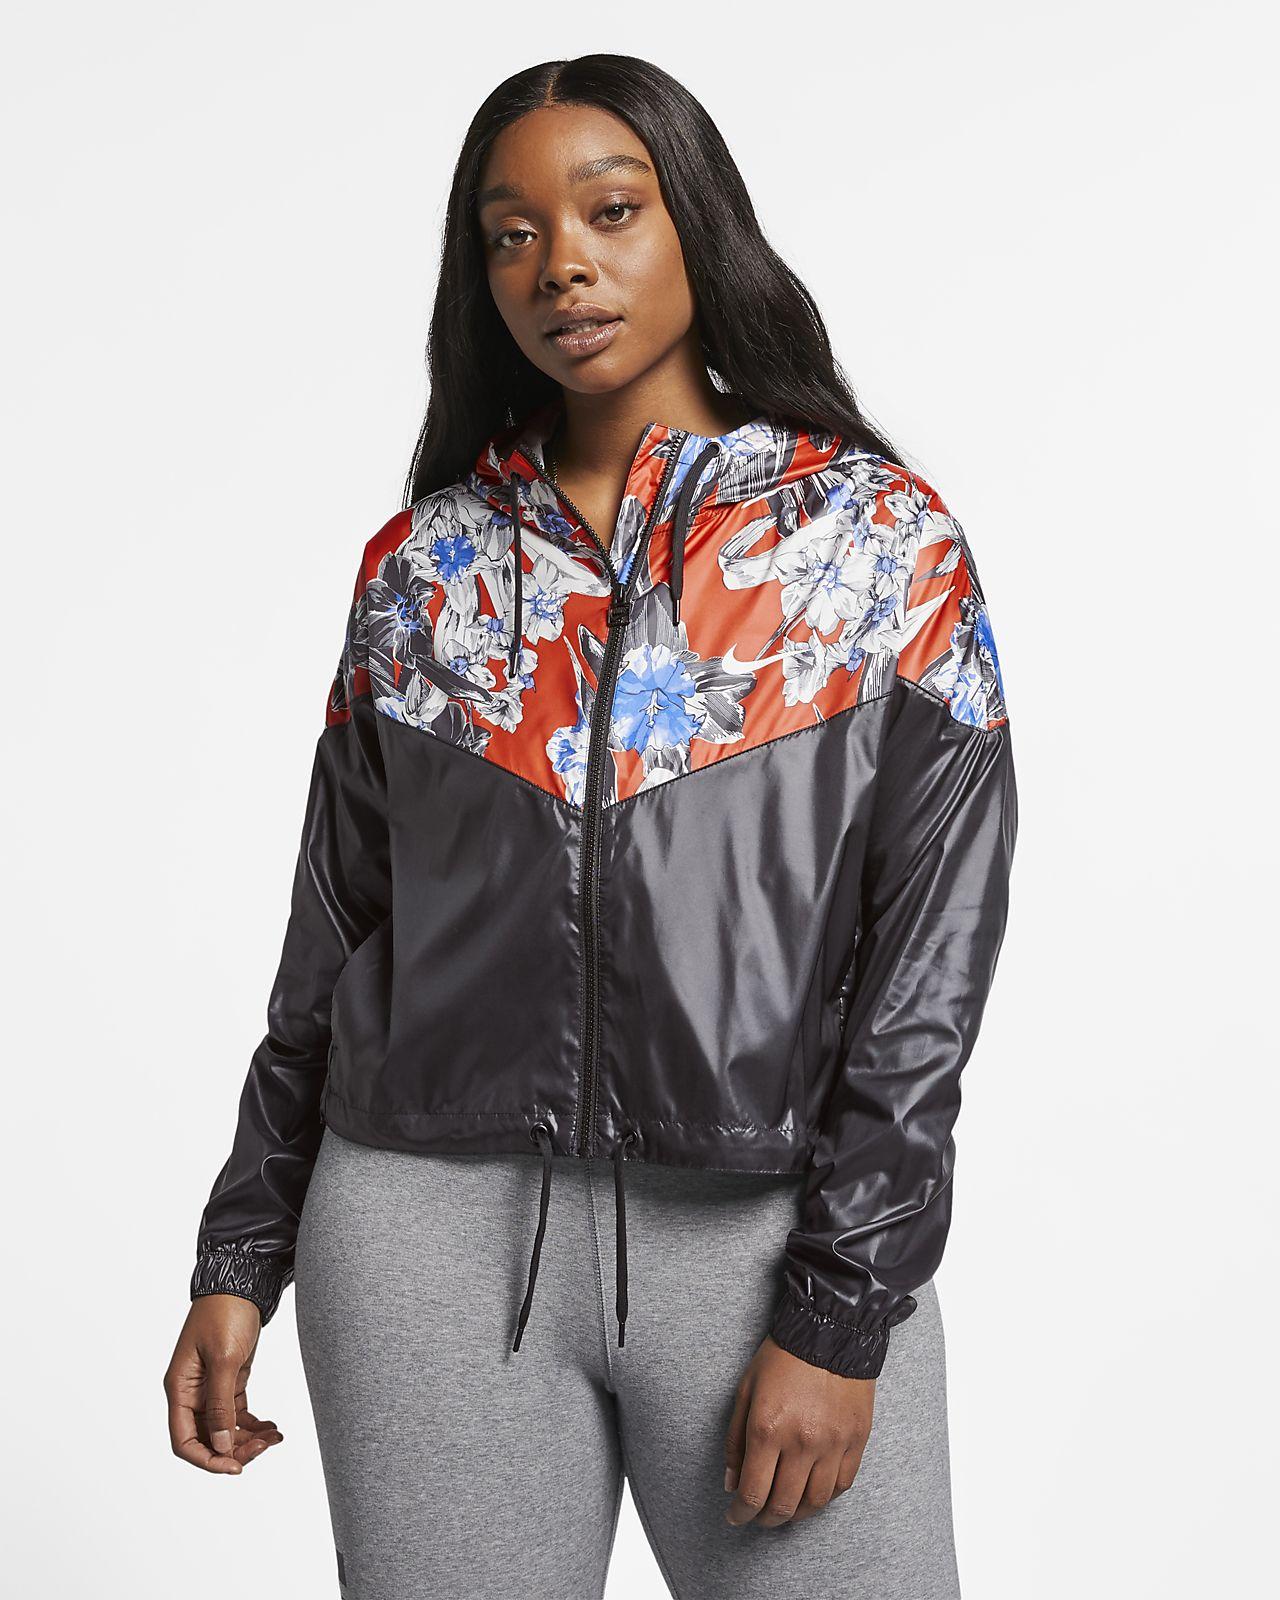 14e0a7c50a7 ... Nike Sportswear Windrunner-cropped jakke med blomsterprint til kvinder (Plus  Size)